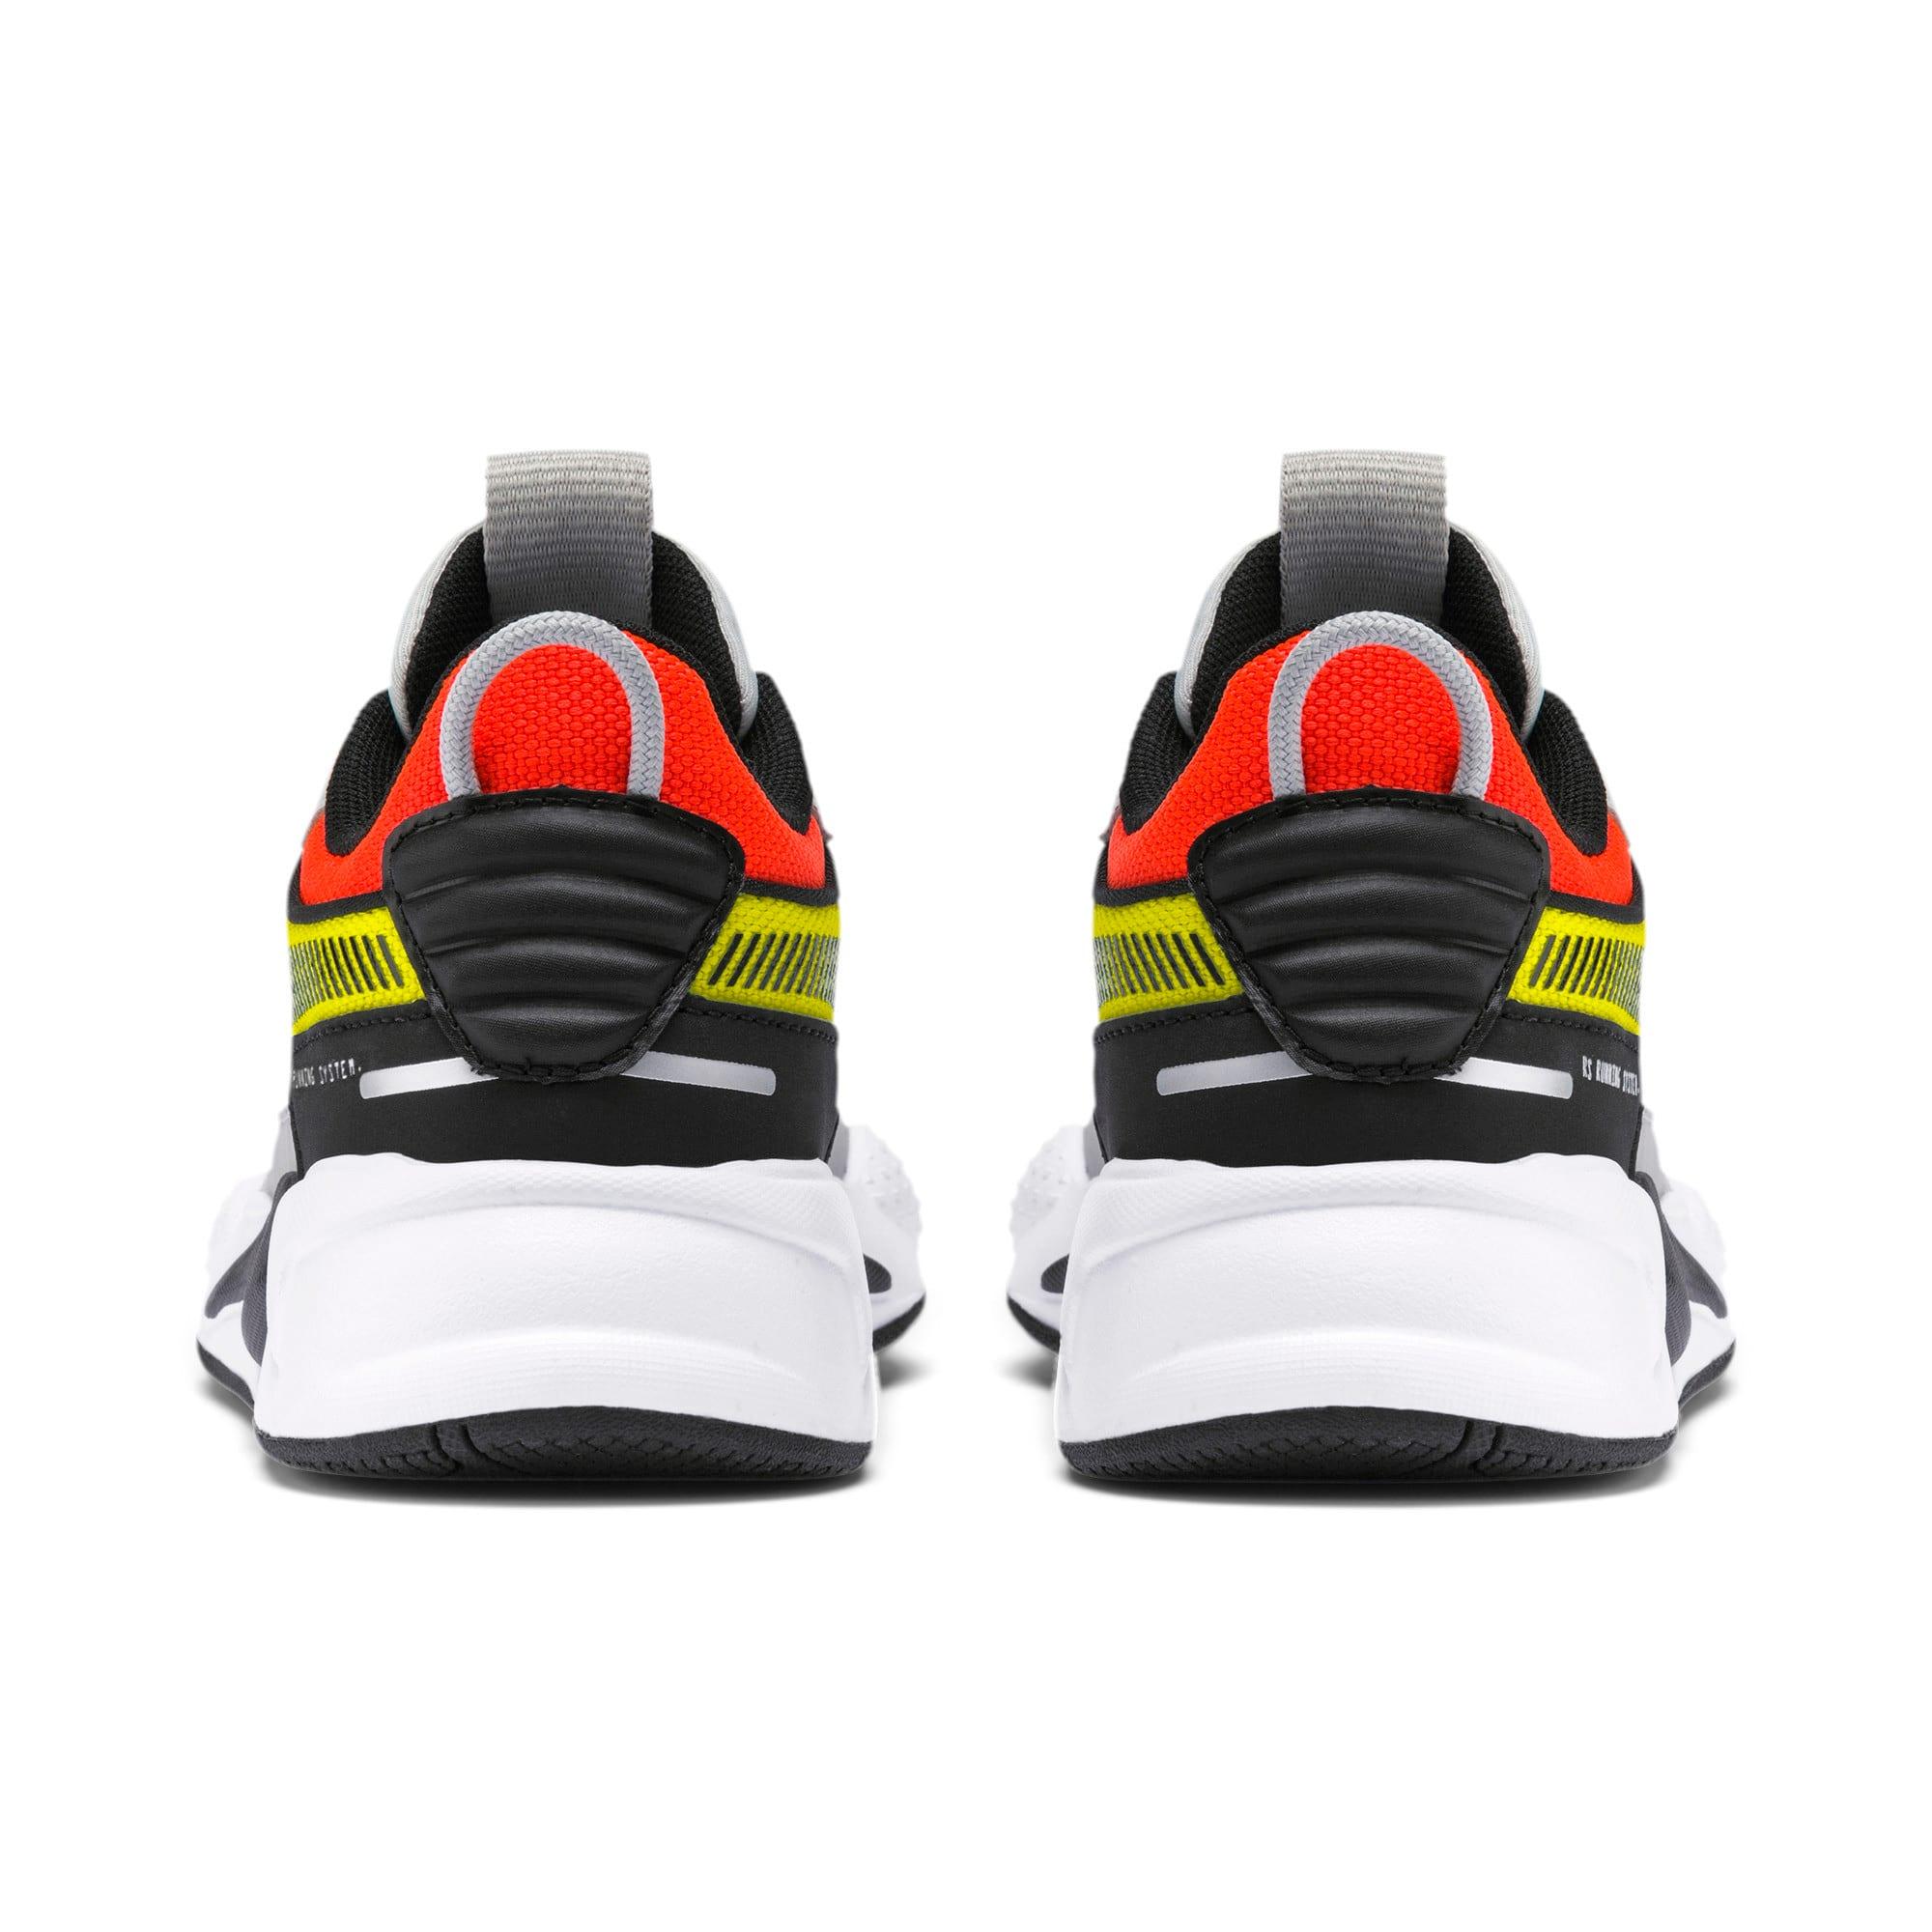 Miniatura 3 de Zapatos RS-X Hard Drive para niño pequeño, High Rise-Yellow Alert, mediano